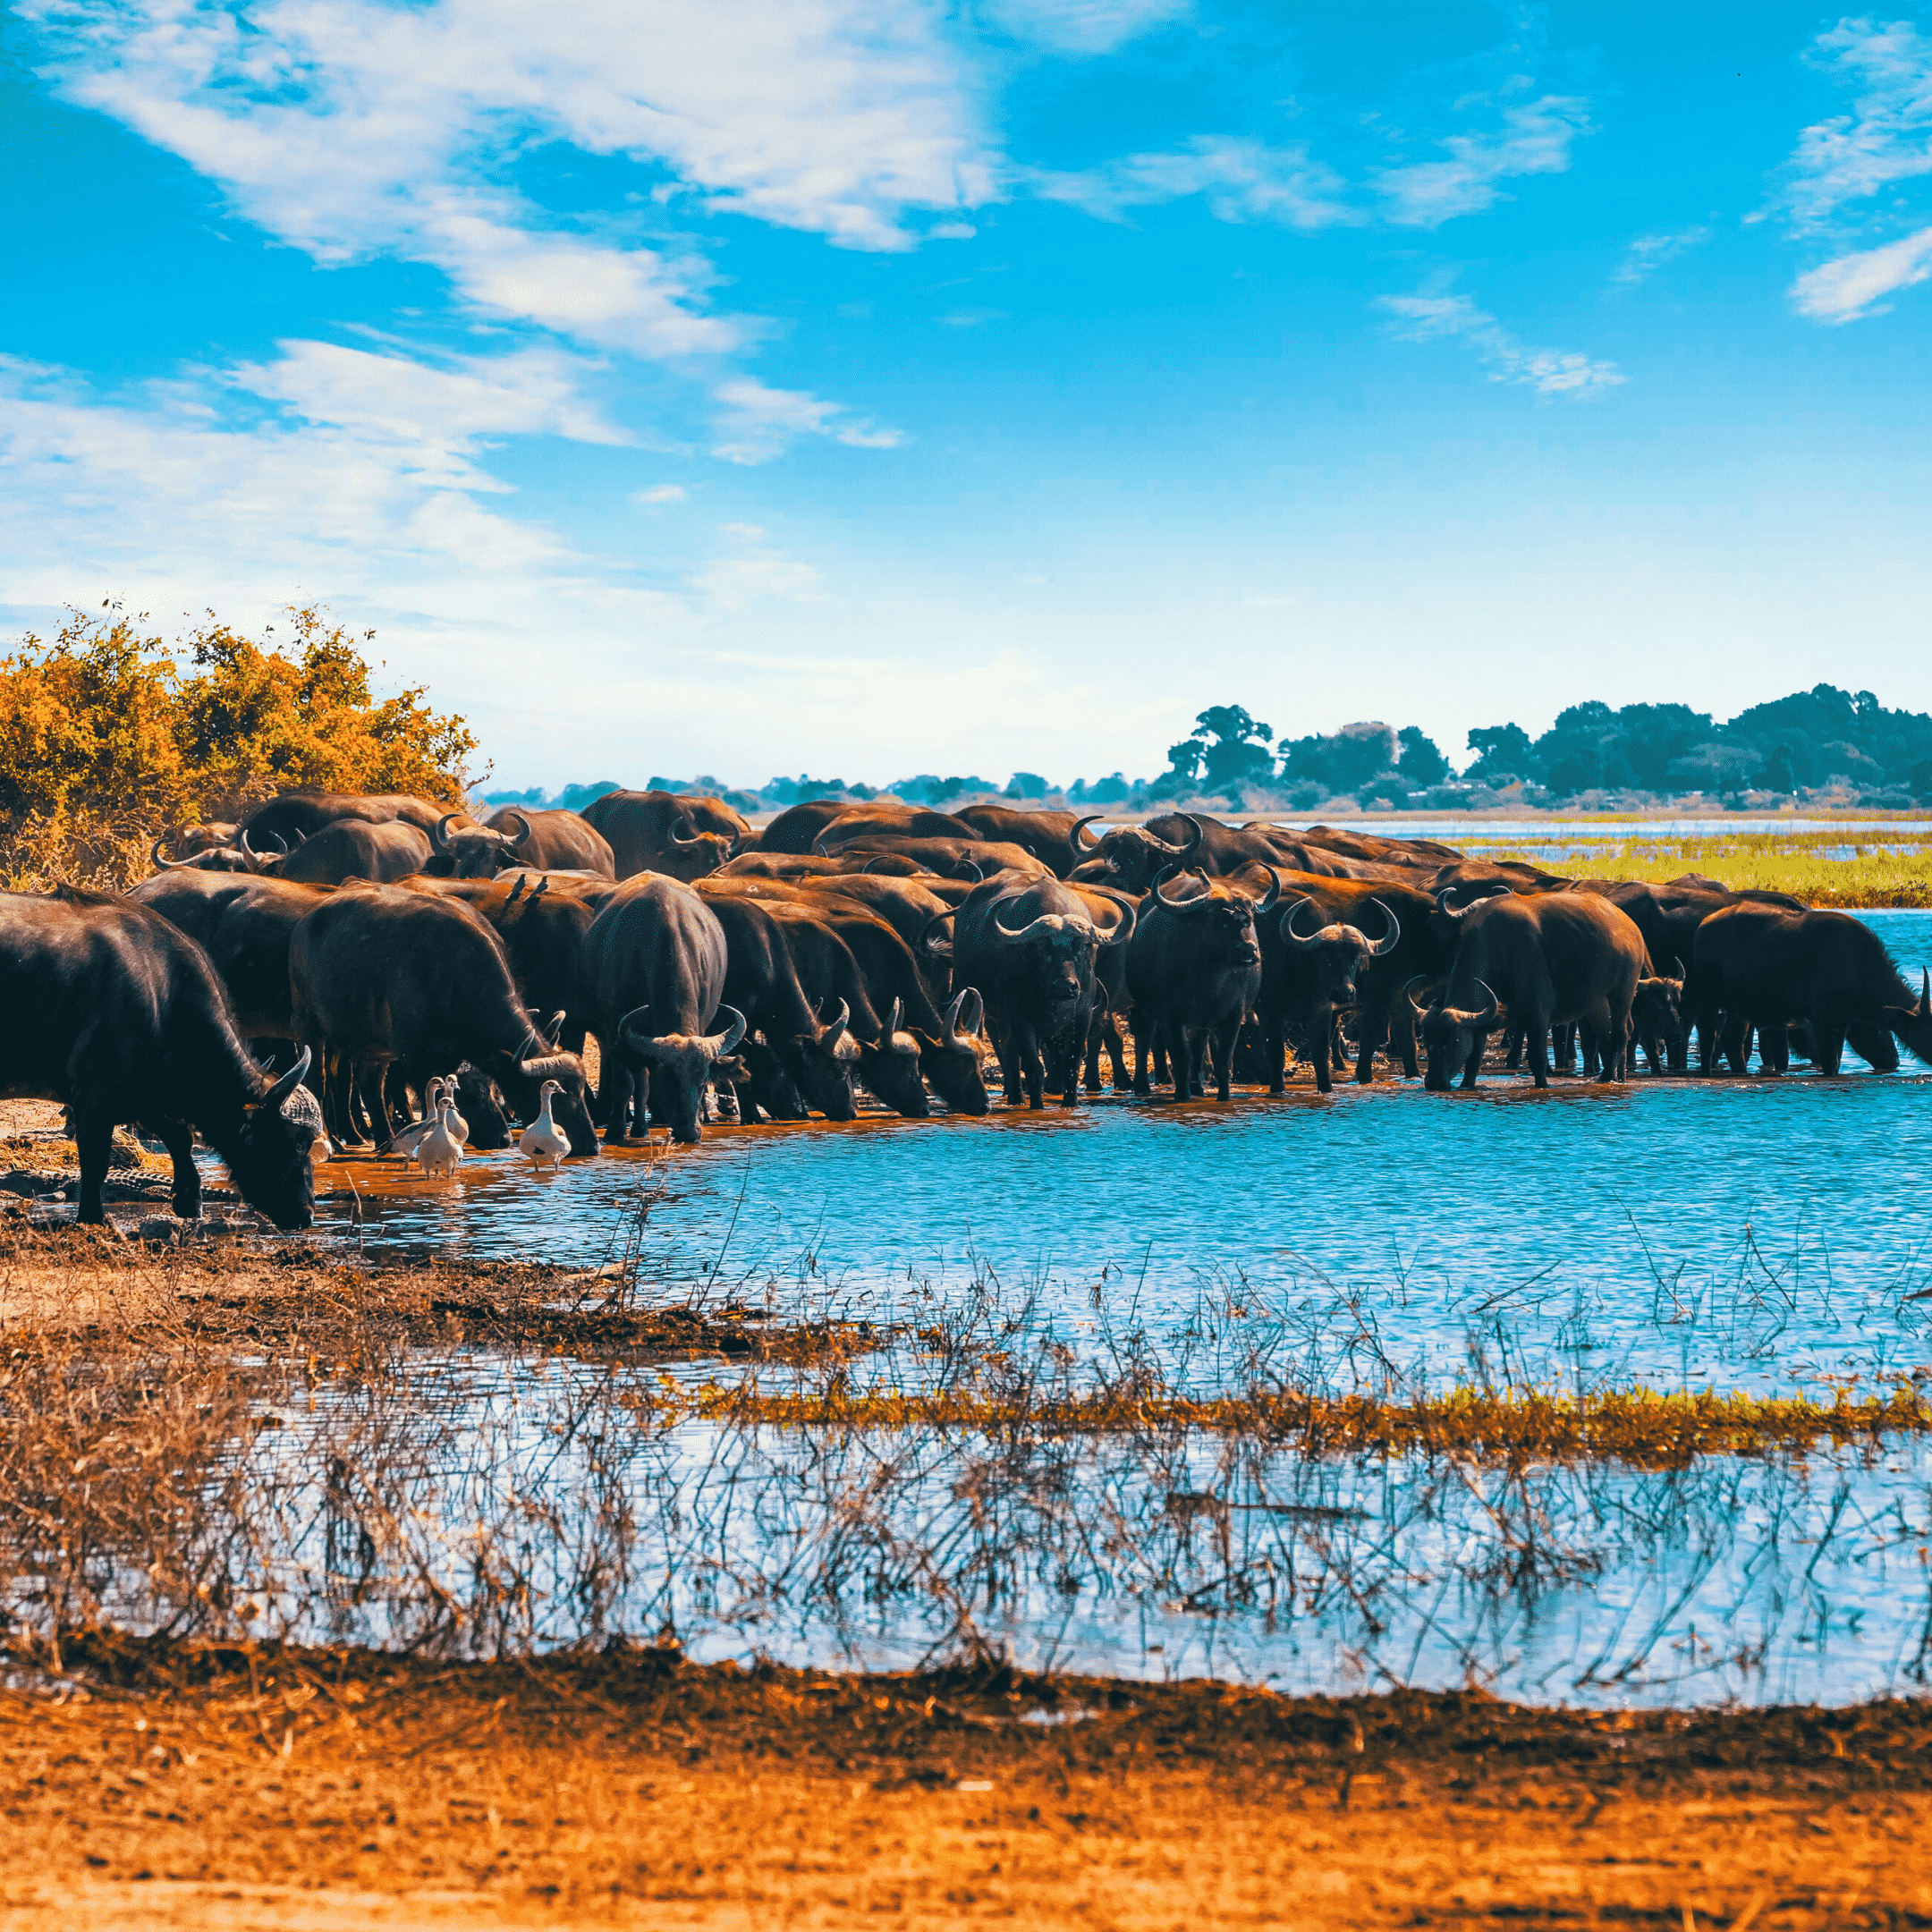 Chobe National Park, Botswana   25 places to visit before turning 25